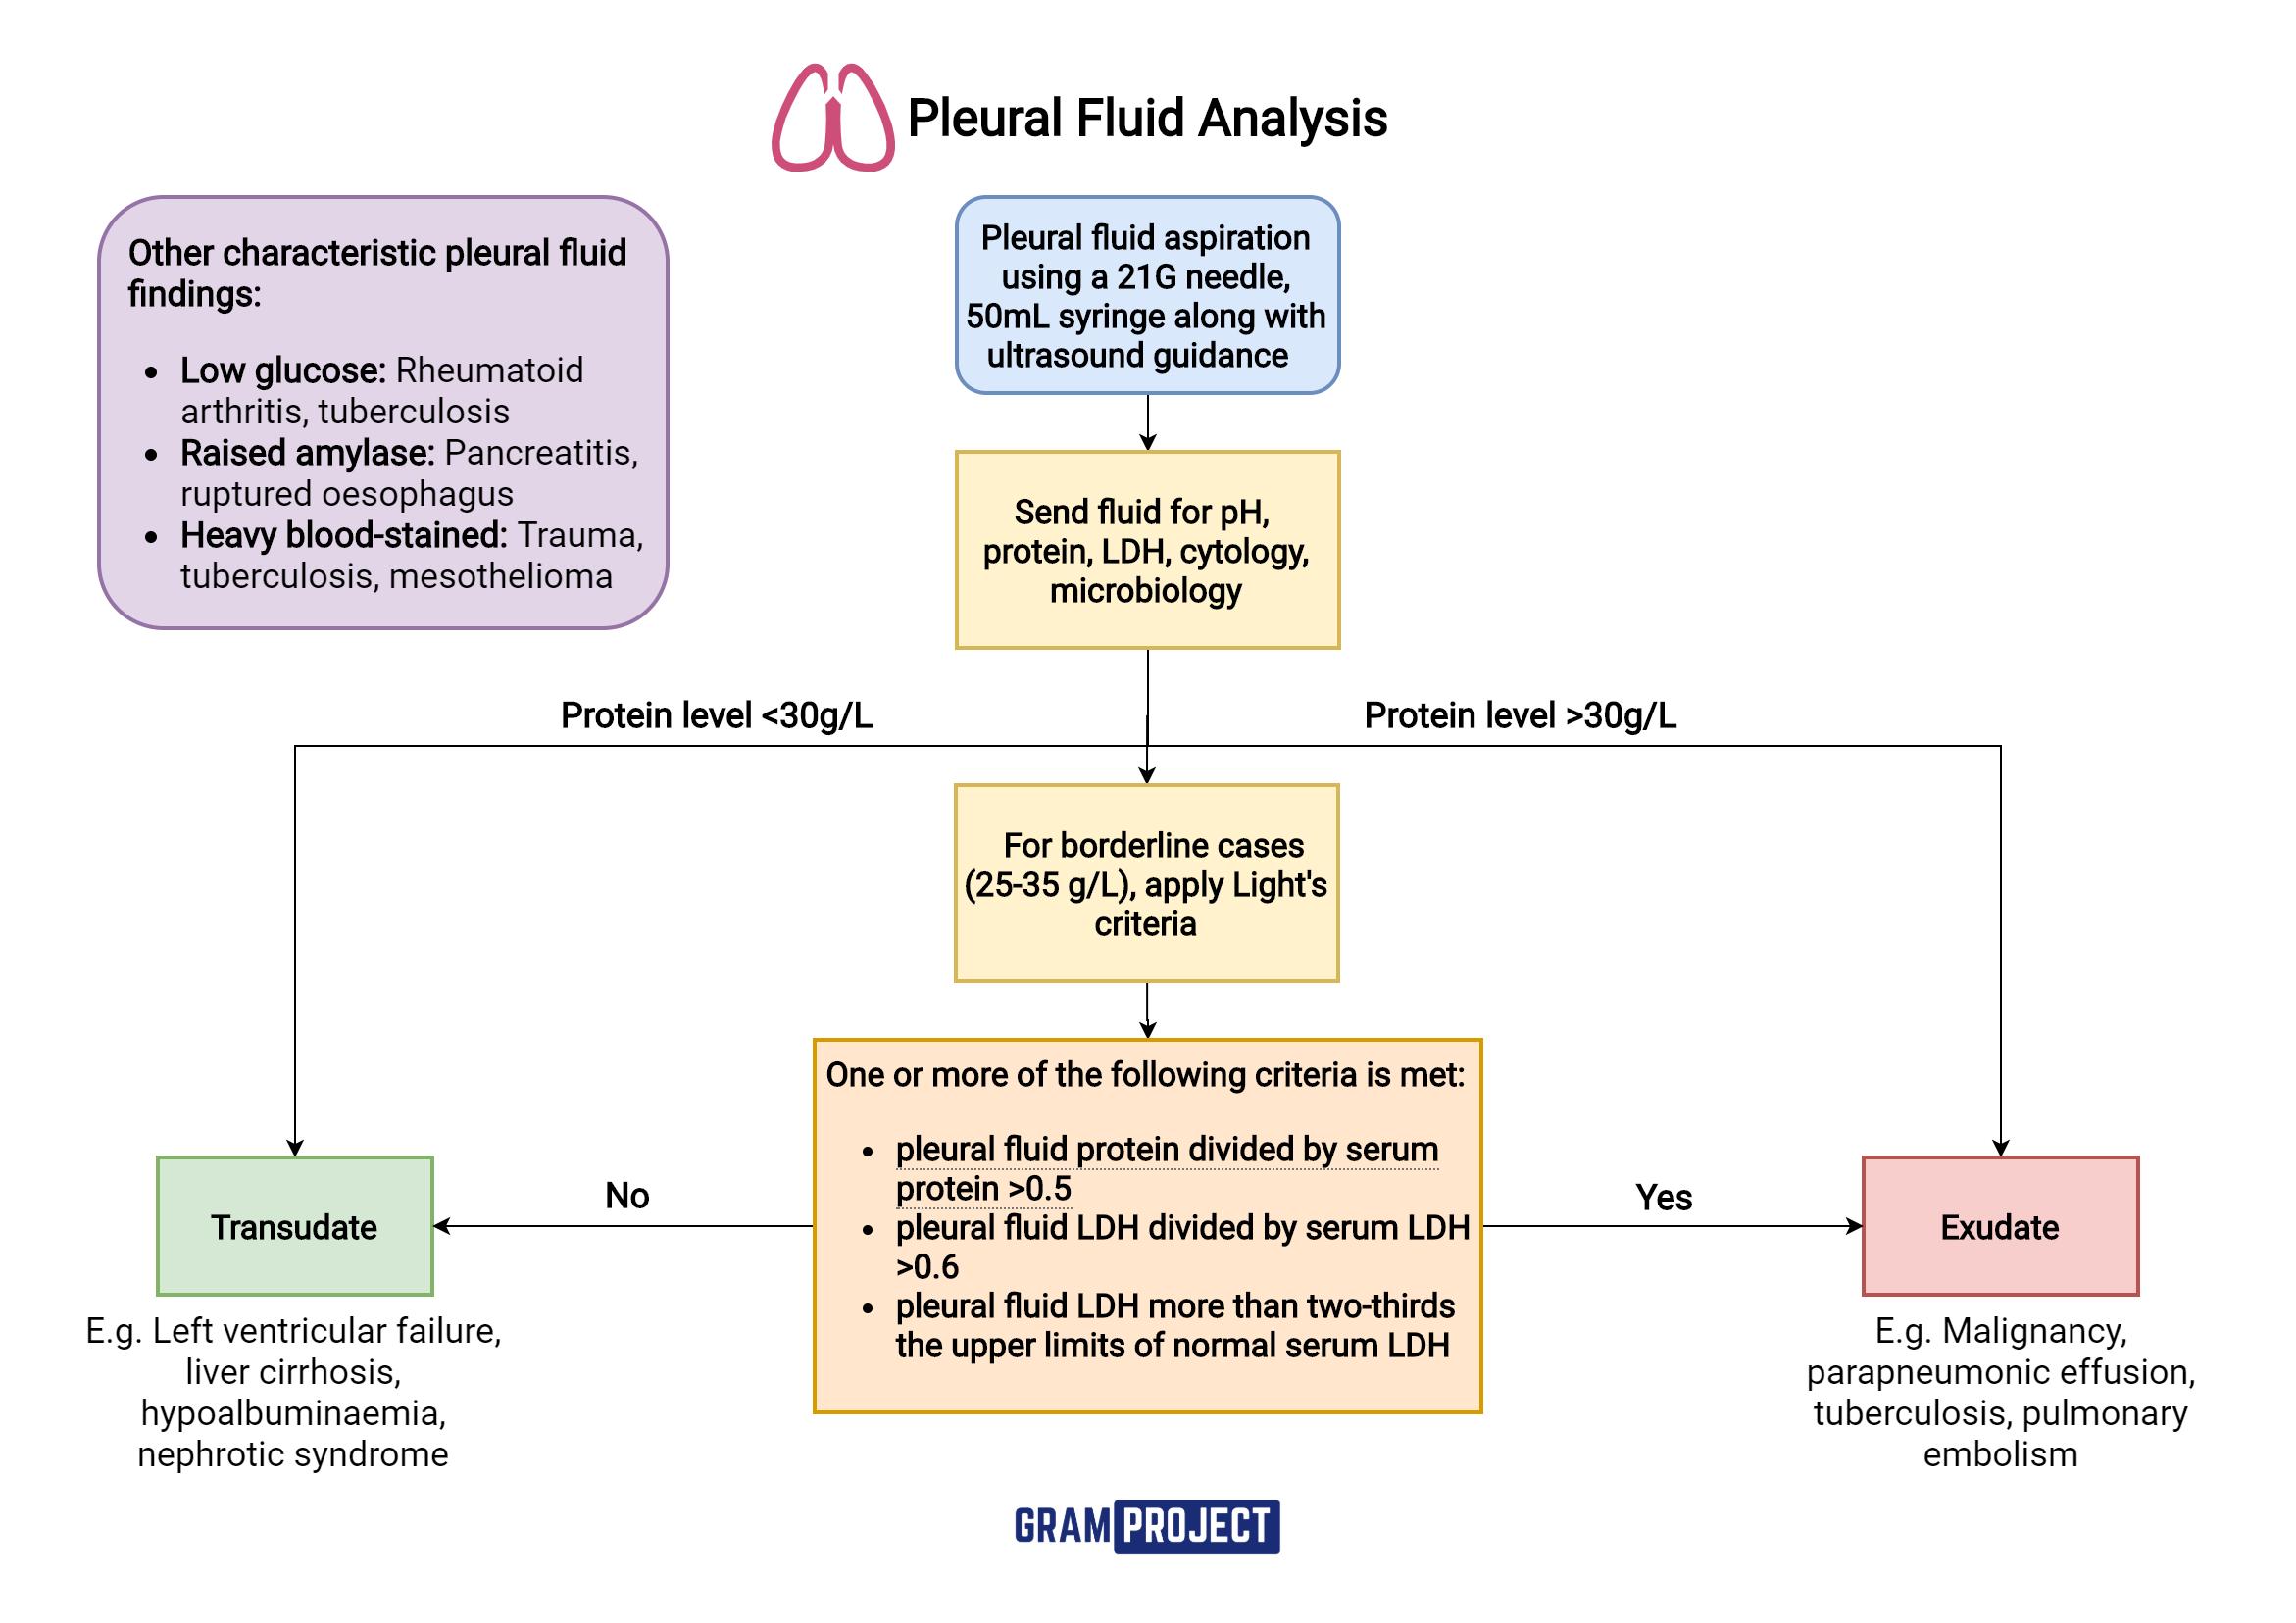 Pleural fluid analysis flowchart using Light's criteria created by Gram Project